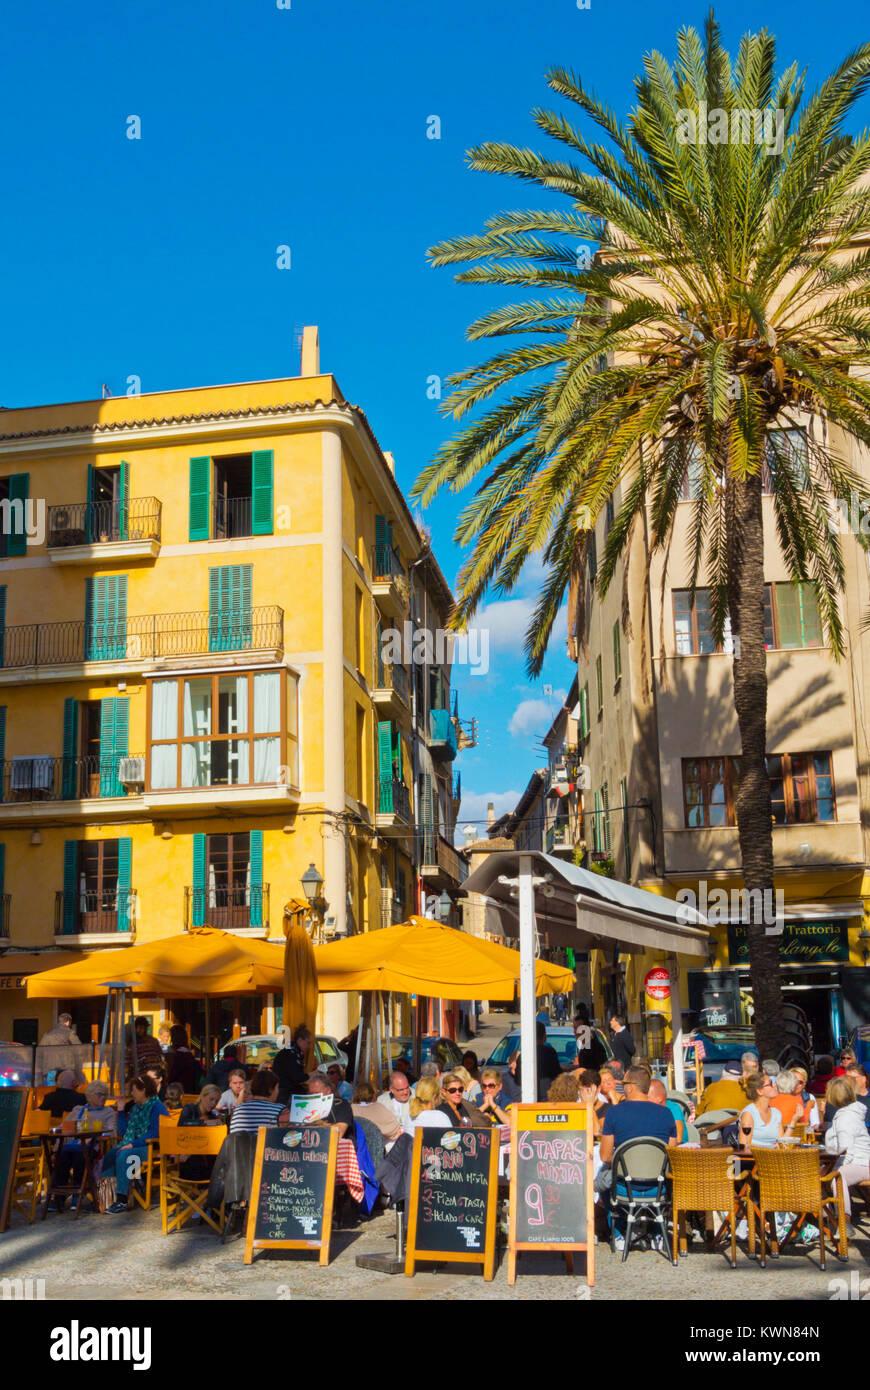 Cafe and restaurant terraces, Placa de la Llotja, Palma, Mallorca, Balearic islands, Spain Stock Photo